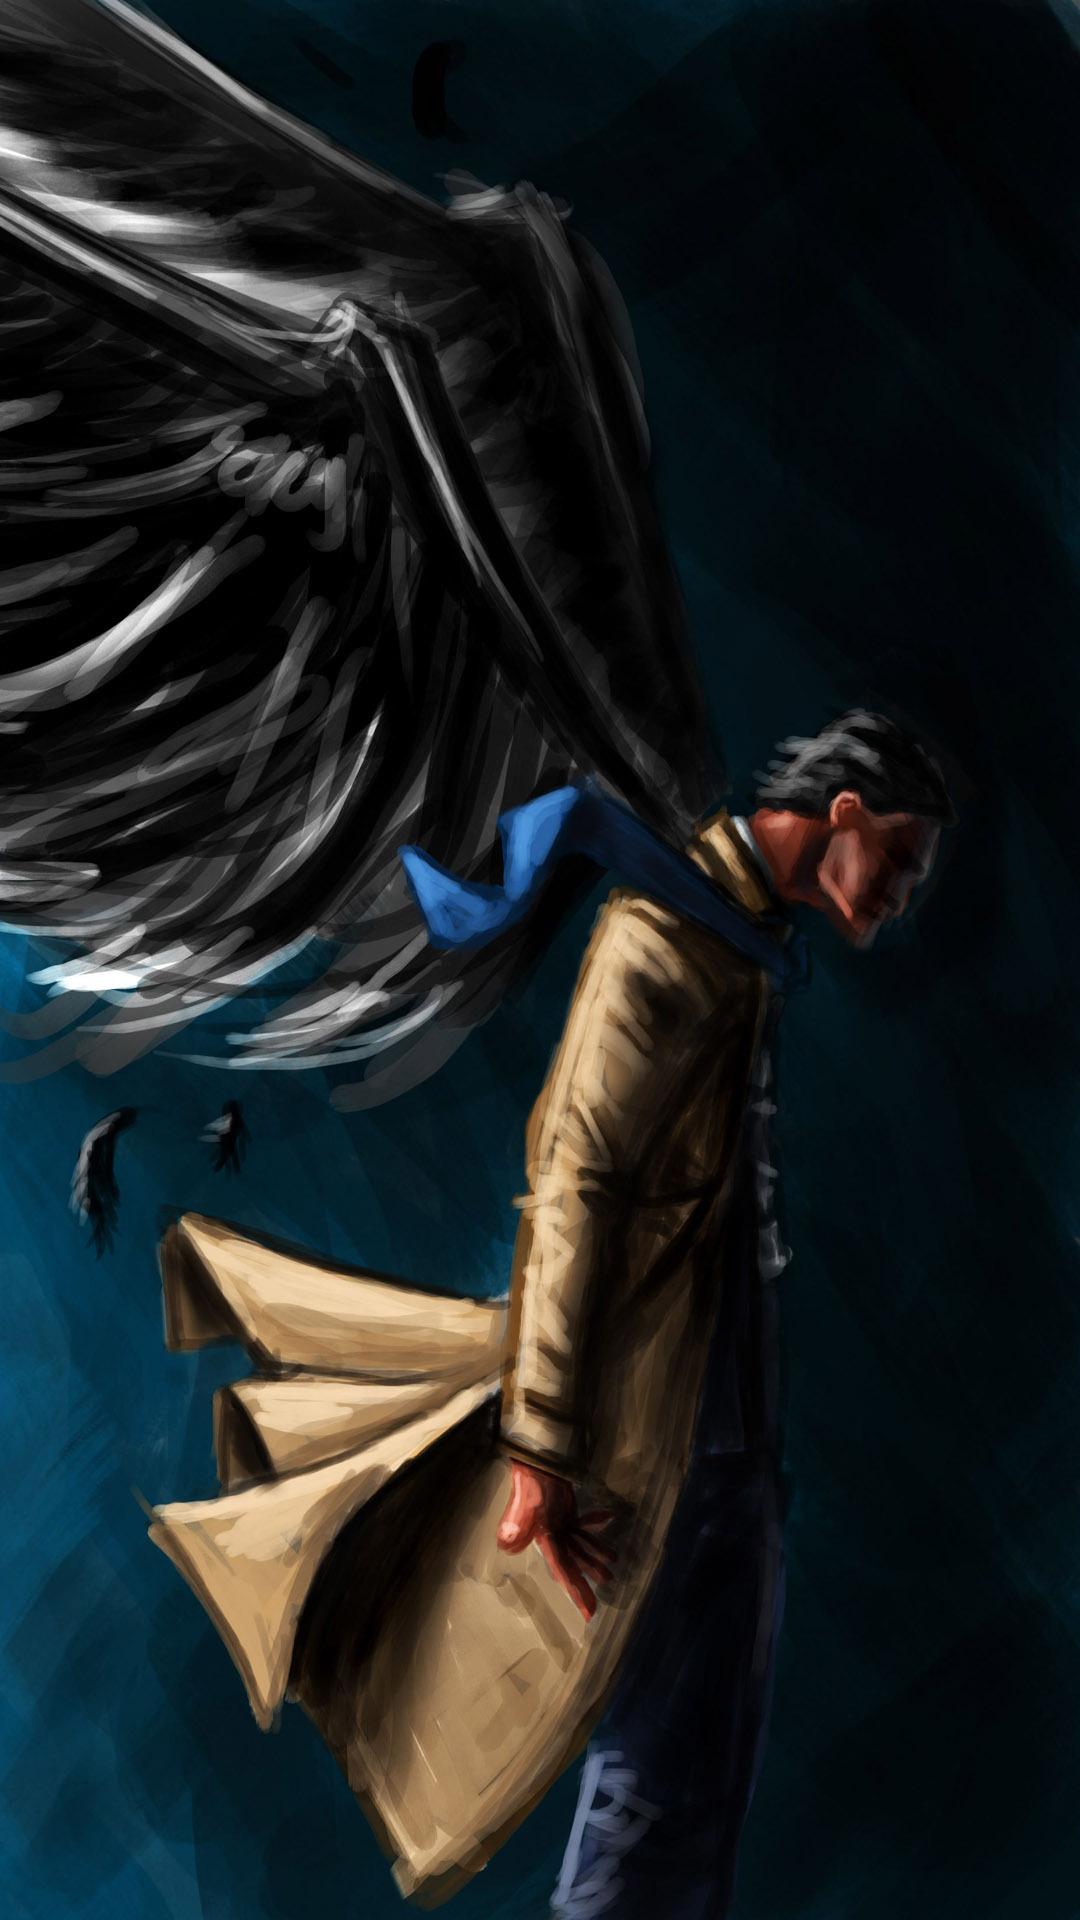 castiel-artwork-supernatural-artistic-mobile-wallpaper-1080x1920-10819-2051933206